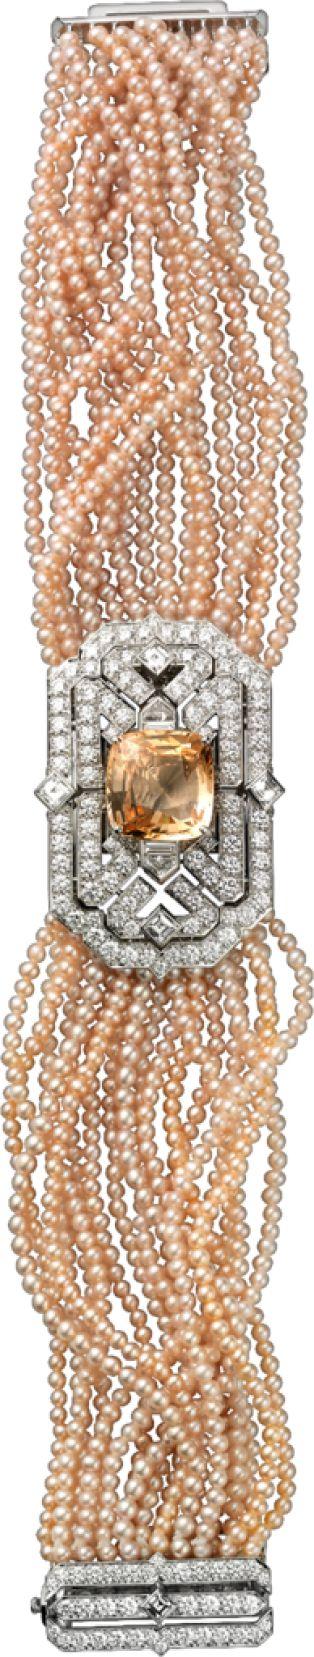 Cartier Haute Joaillerie watch Small model